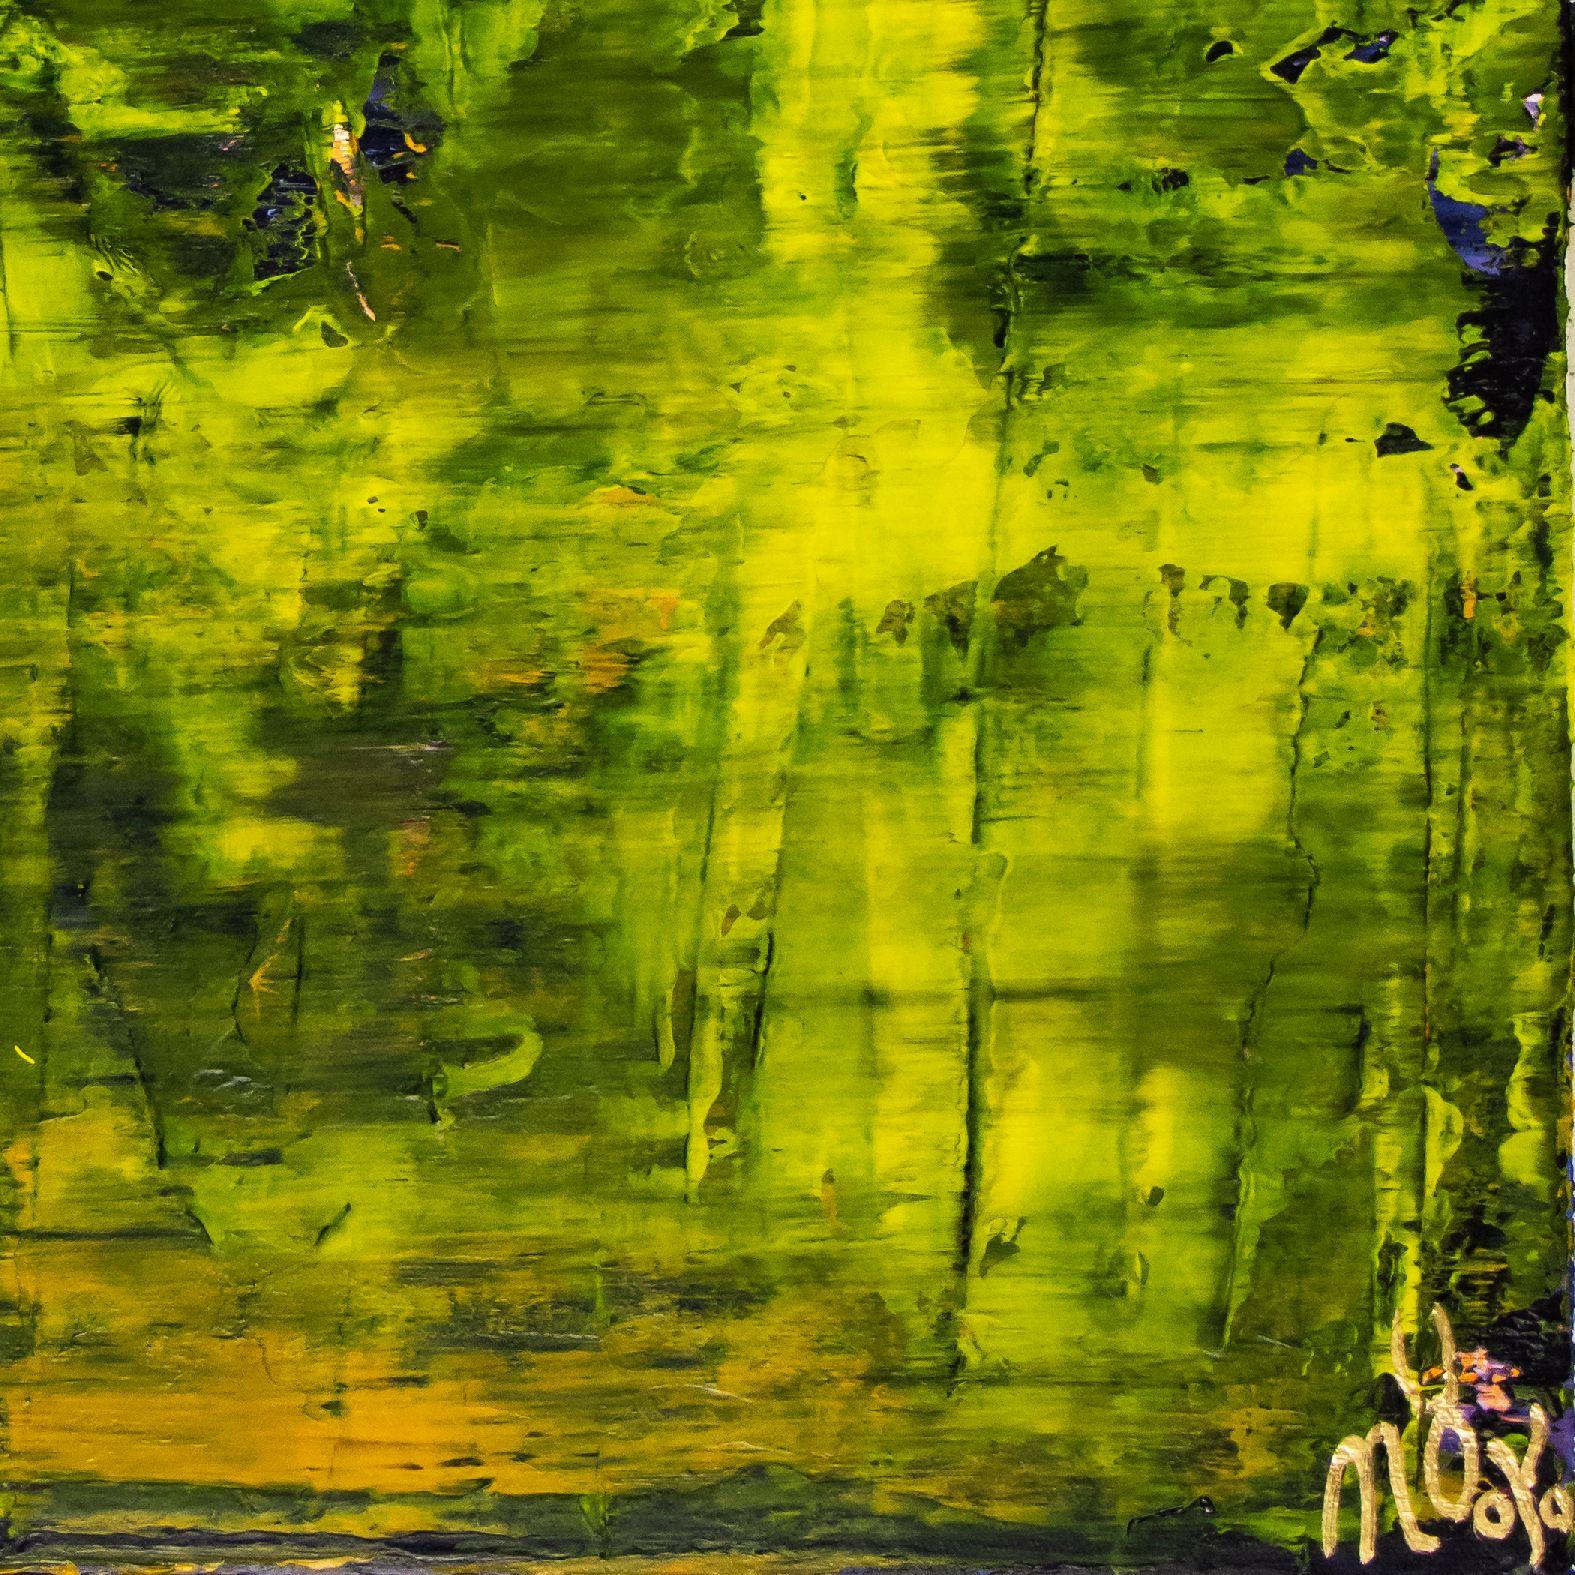 Signature - Sunny Forest Canopy (2020) by Nestor Toro